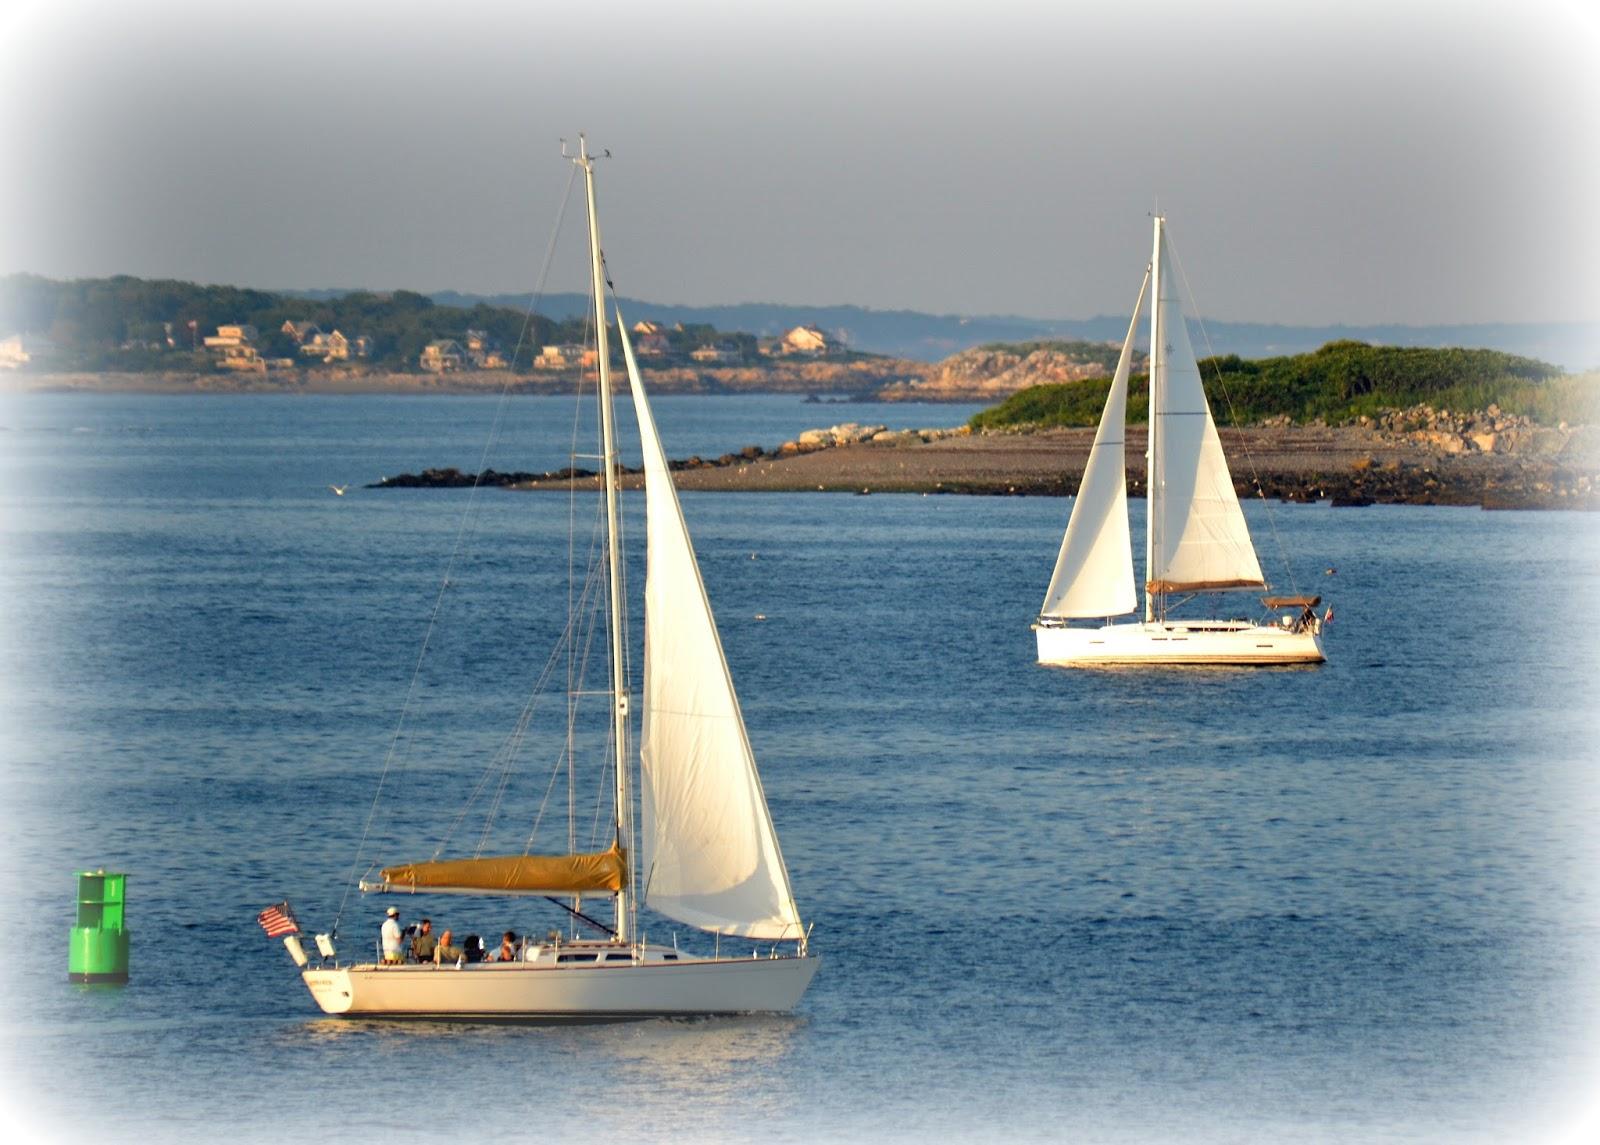 sailing, boats, island, buoy, summer, wind, peaceful